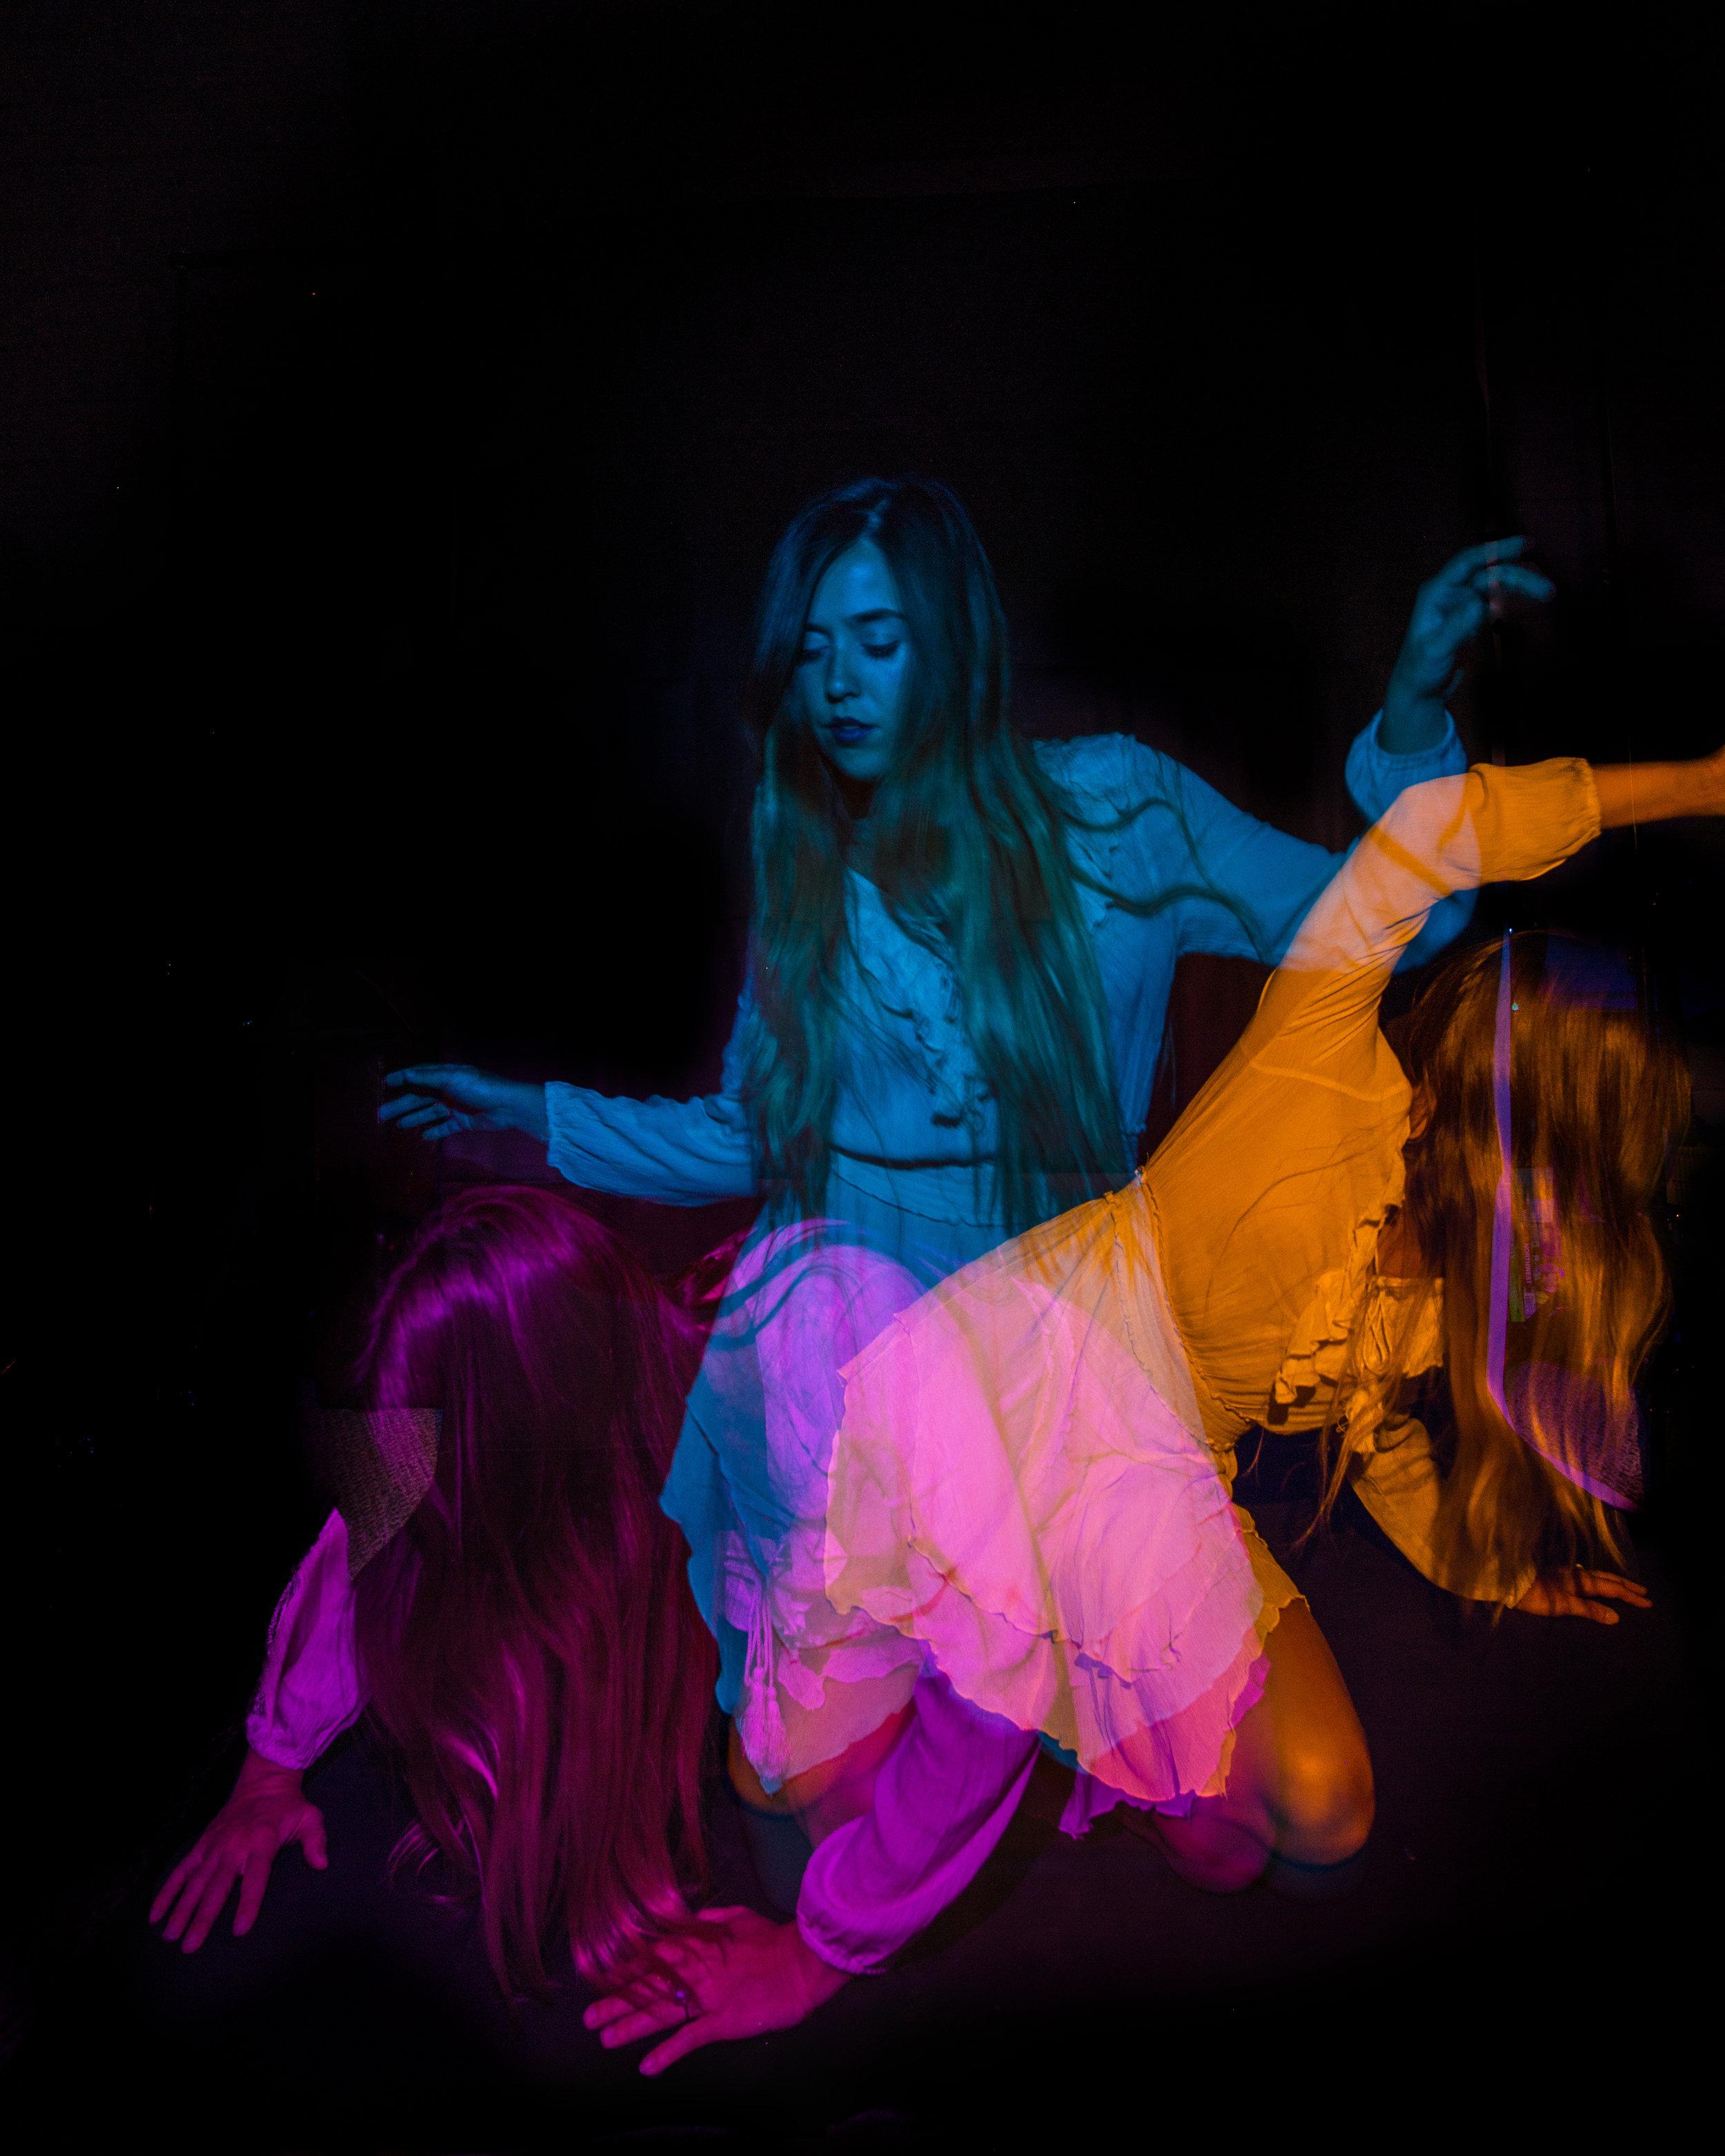 JordanRose_DarrenPearson_AstroBandit_DariusTwin_lightpainting_psychedelic_dancer_5.jpg